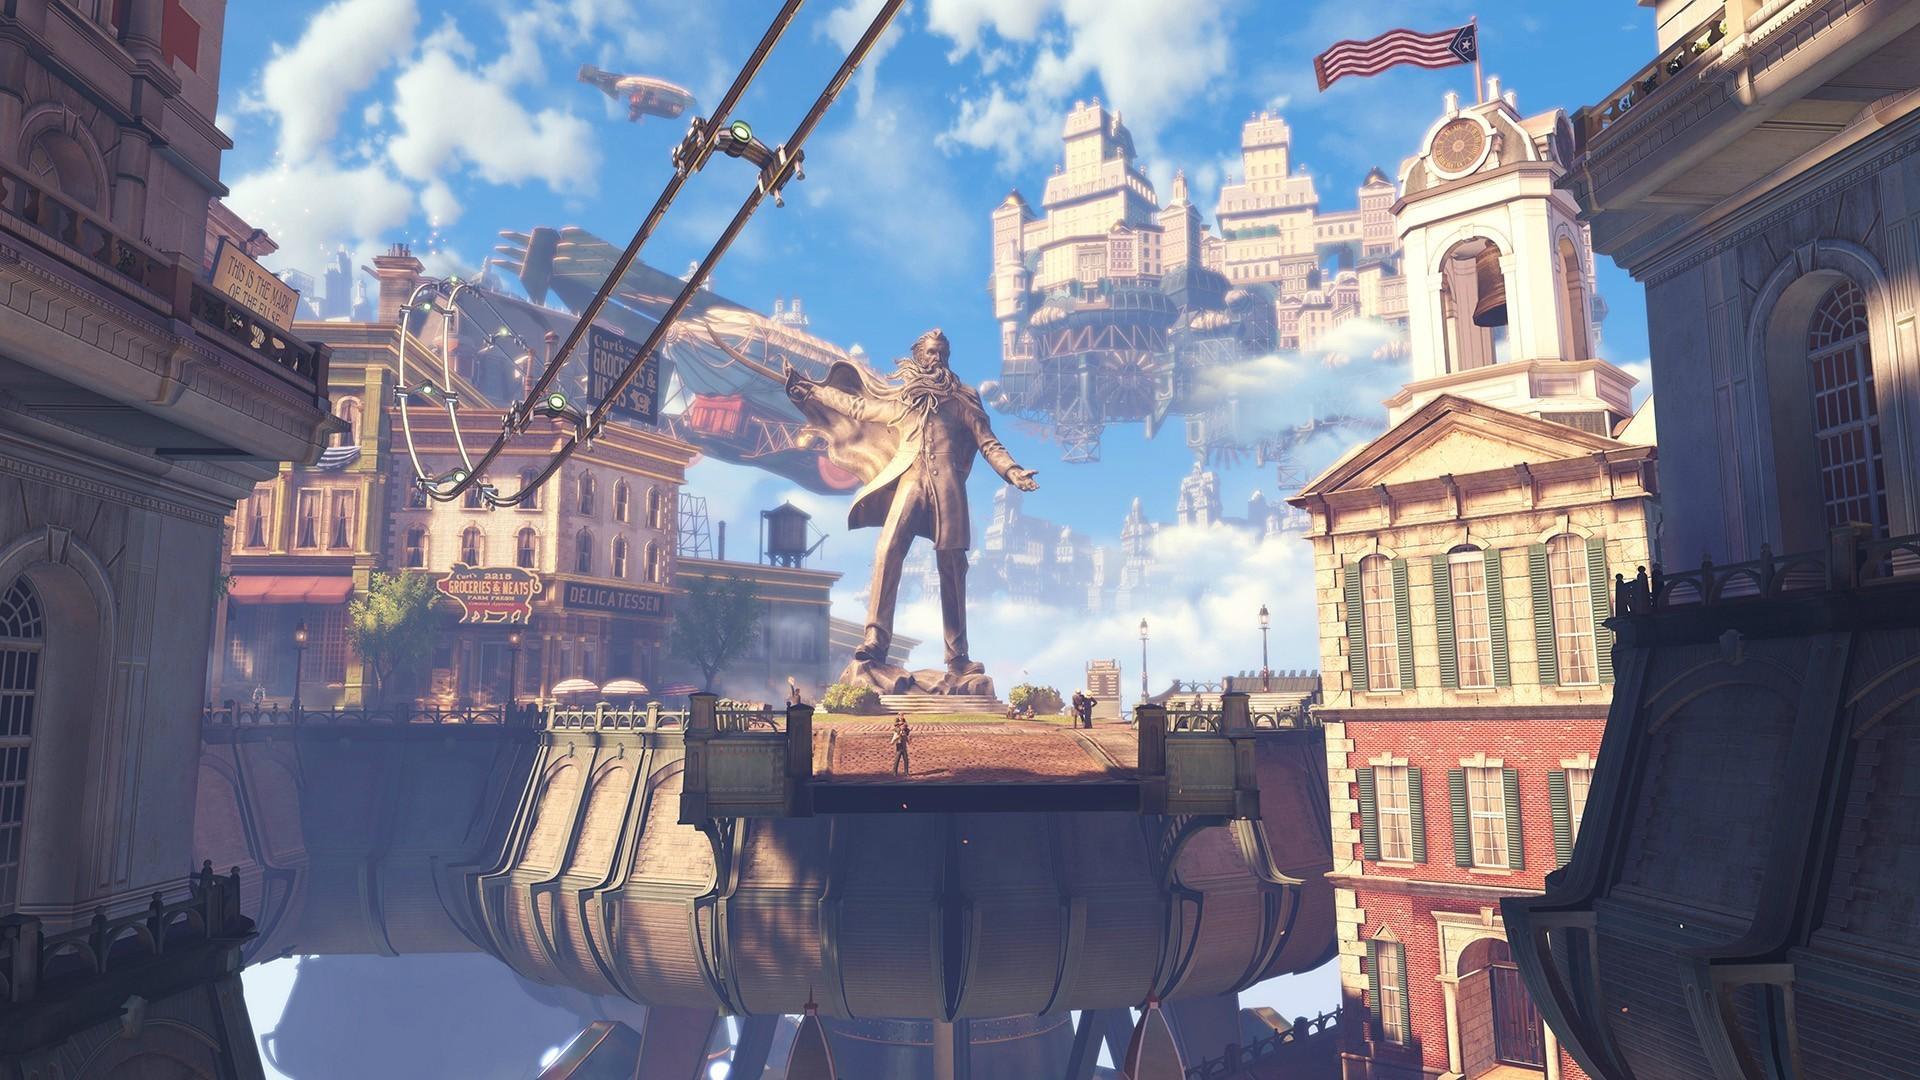 Video Games City Street Cityscape Tourism Evening Town BioShock Infinite Cathedral Travel Landmark Urban Area